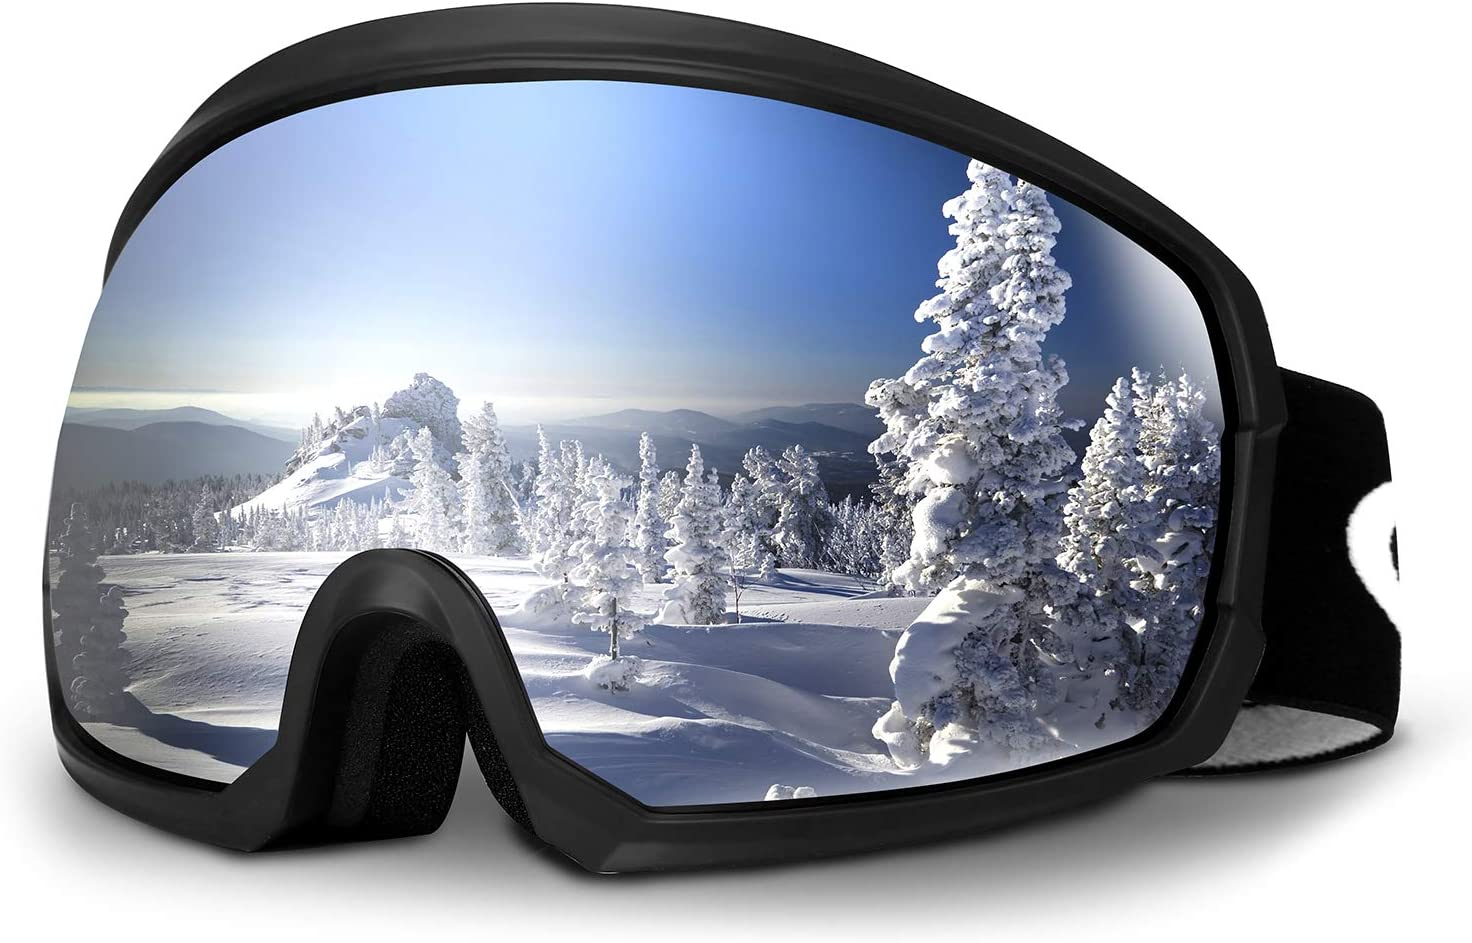 Moongo Tool Ski Goggles, Snowboard Snow Goggles for Men Women Youth Unisex Winter Glasses OTG Design Anti-Fog 100 UV400 Protection Compatible for Ski Helmet, Outdoor Gear